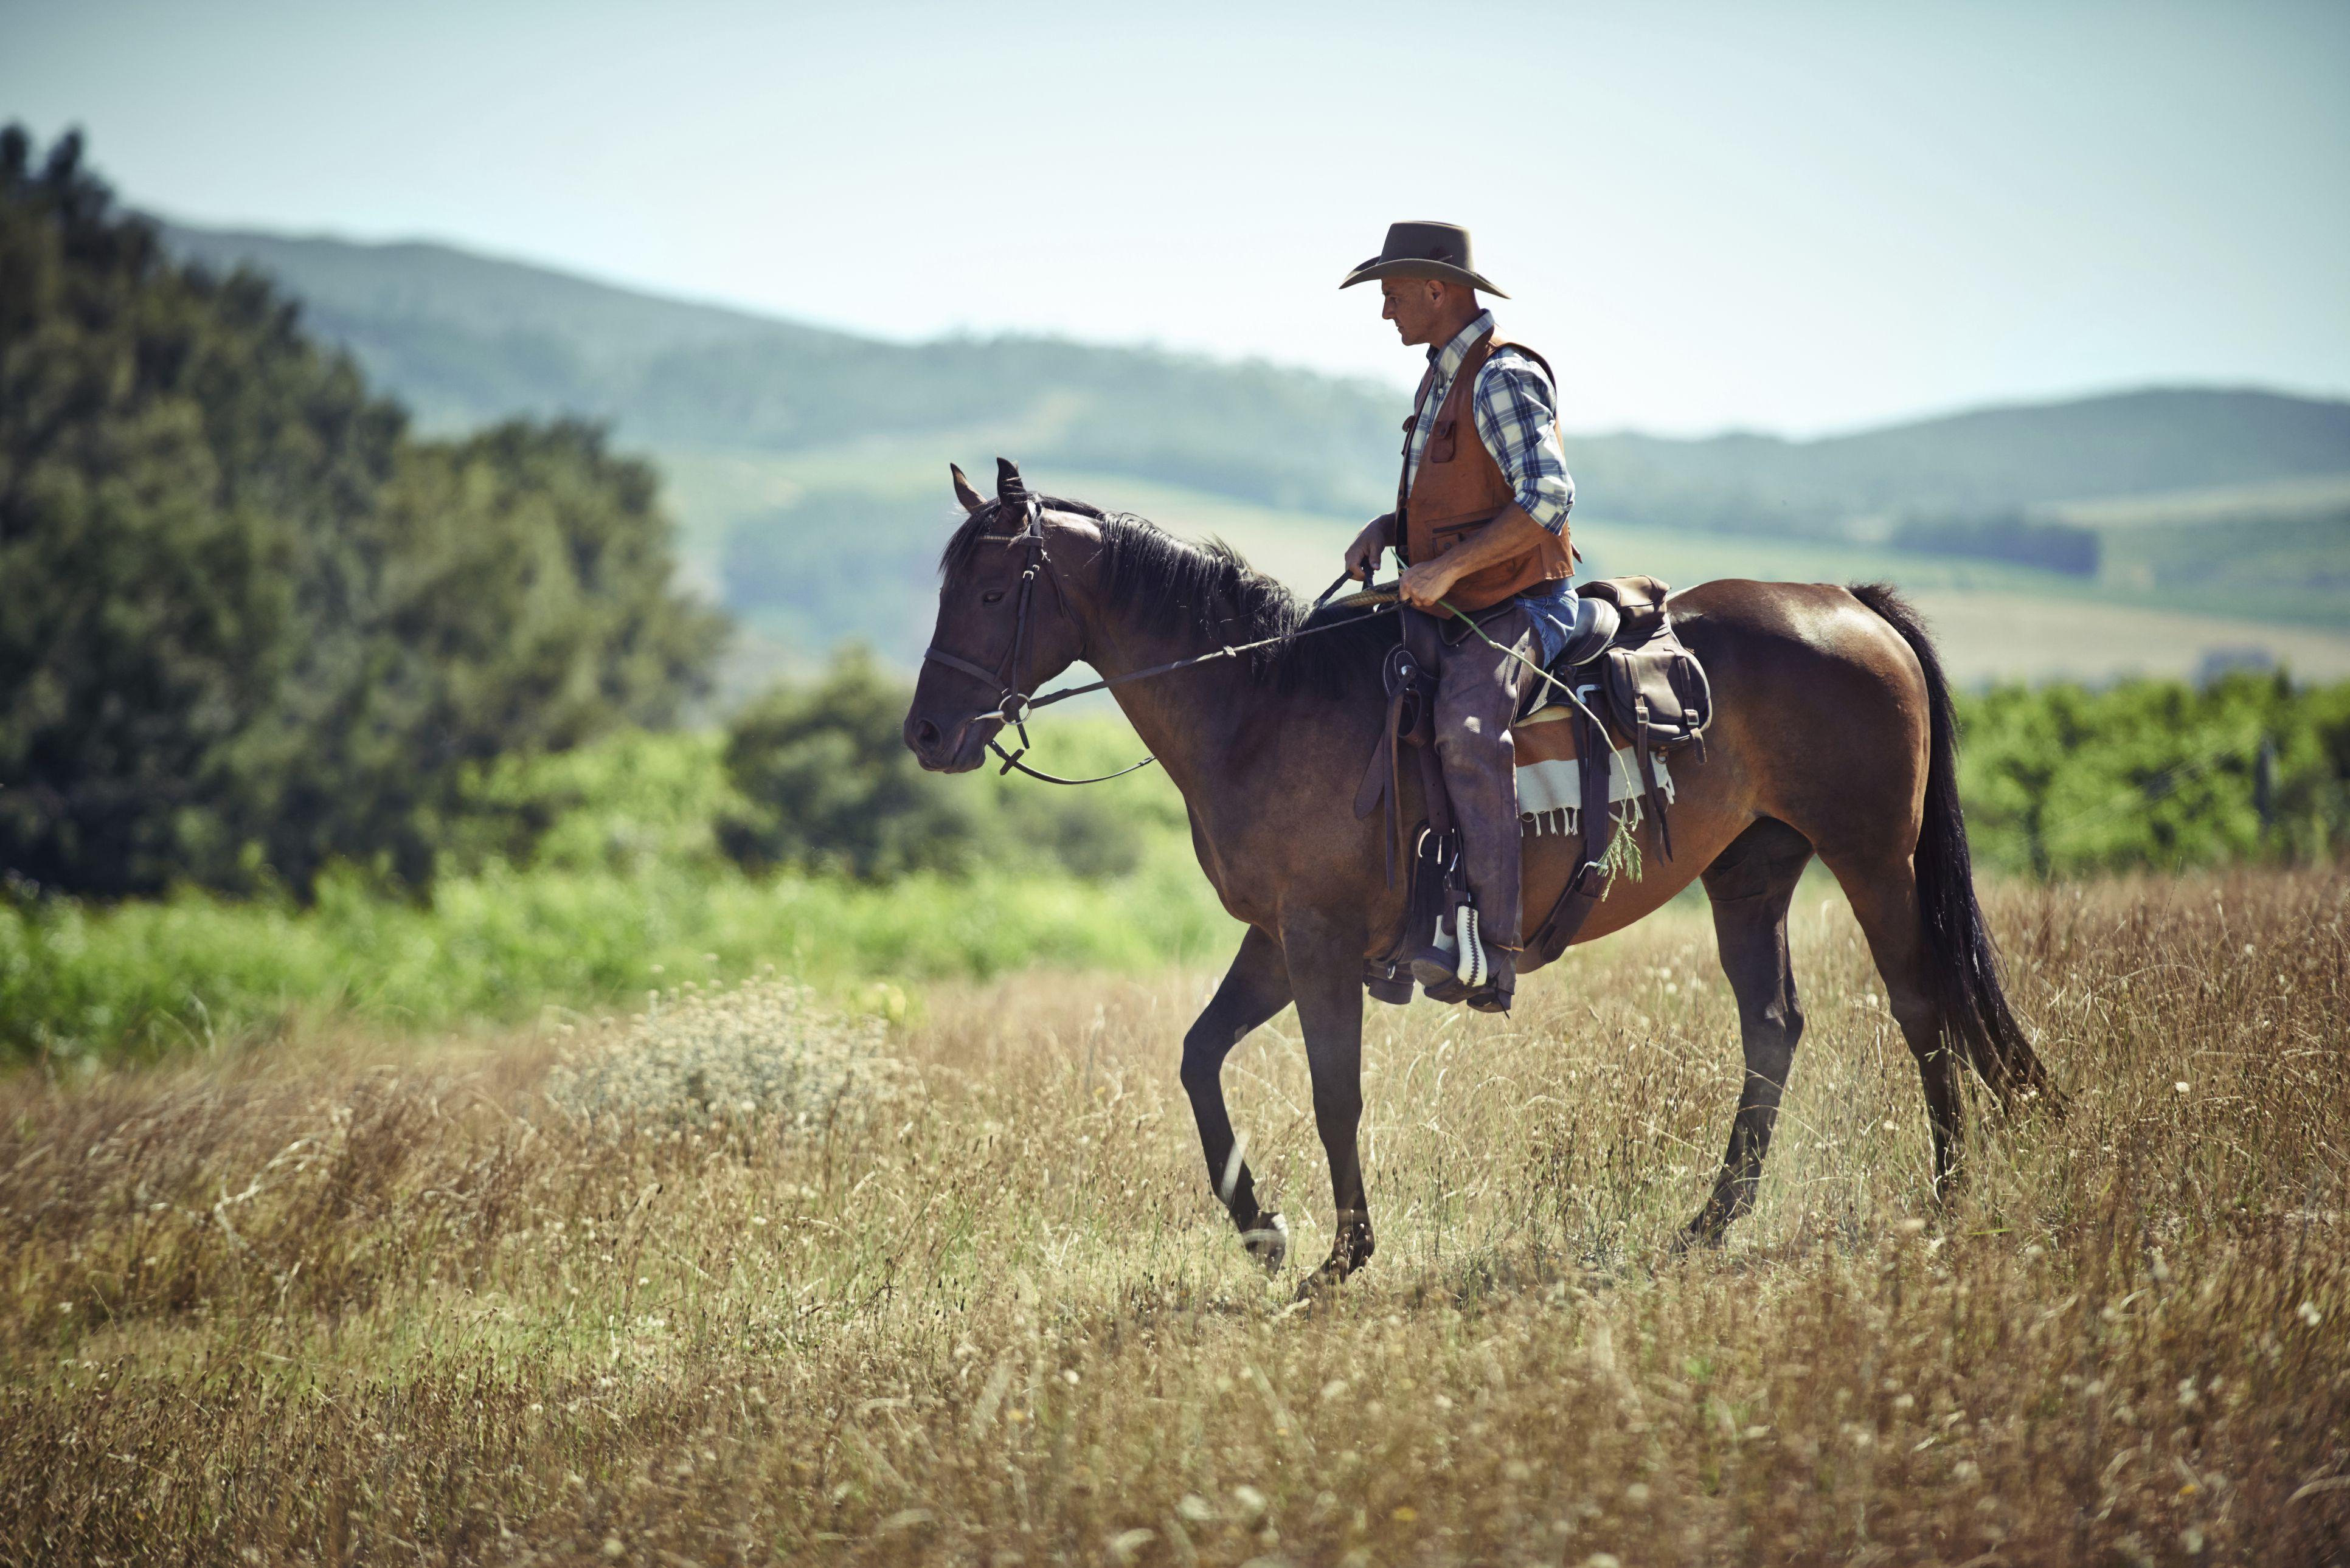 Choosing Safe Horseback Riding Boots